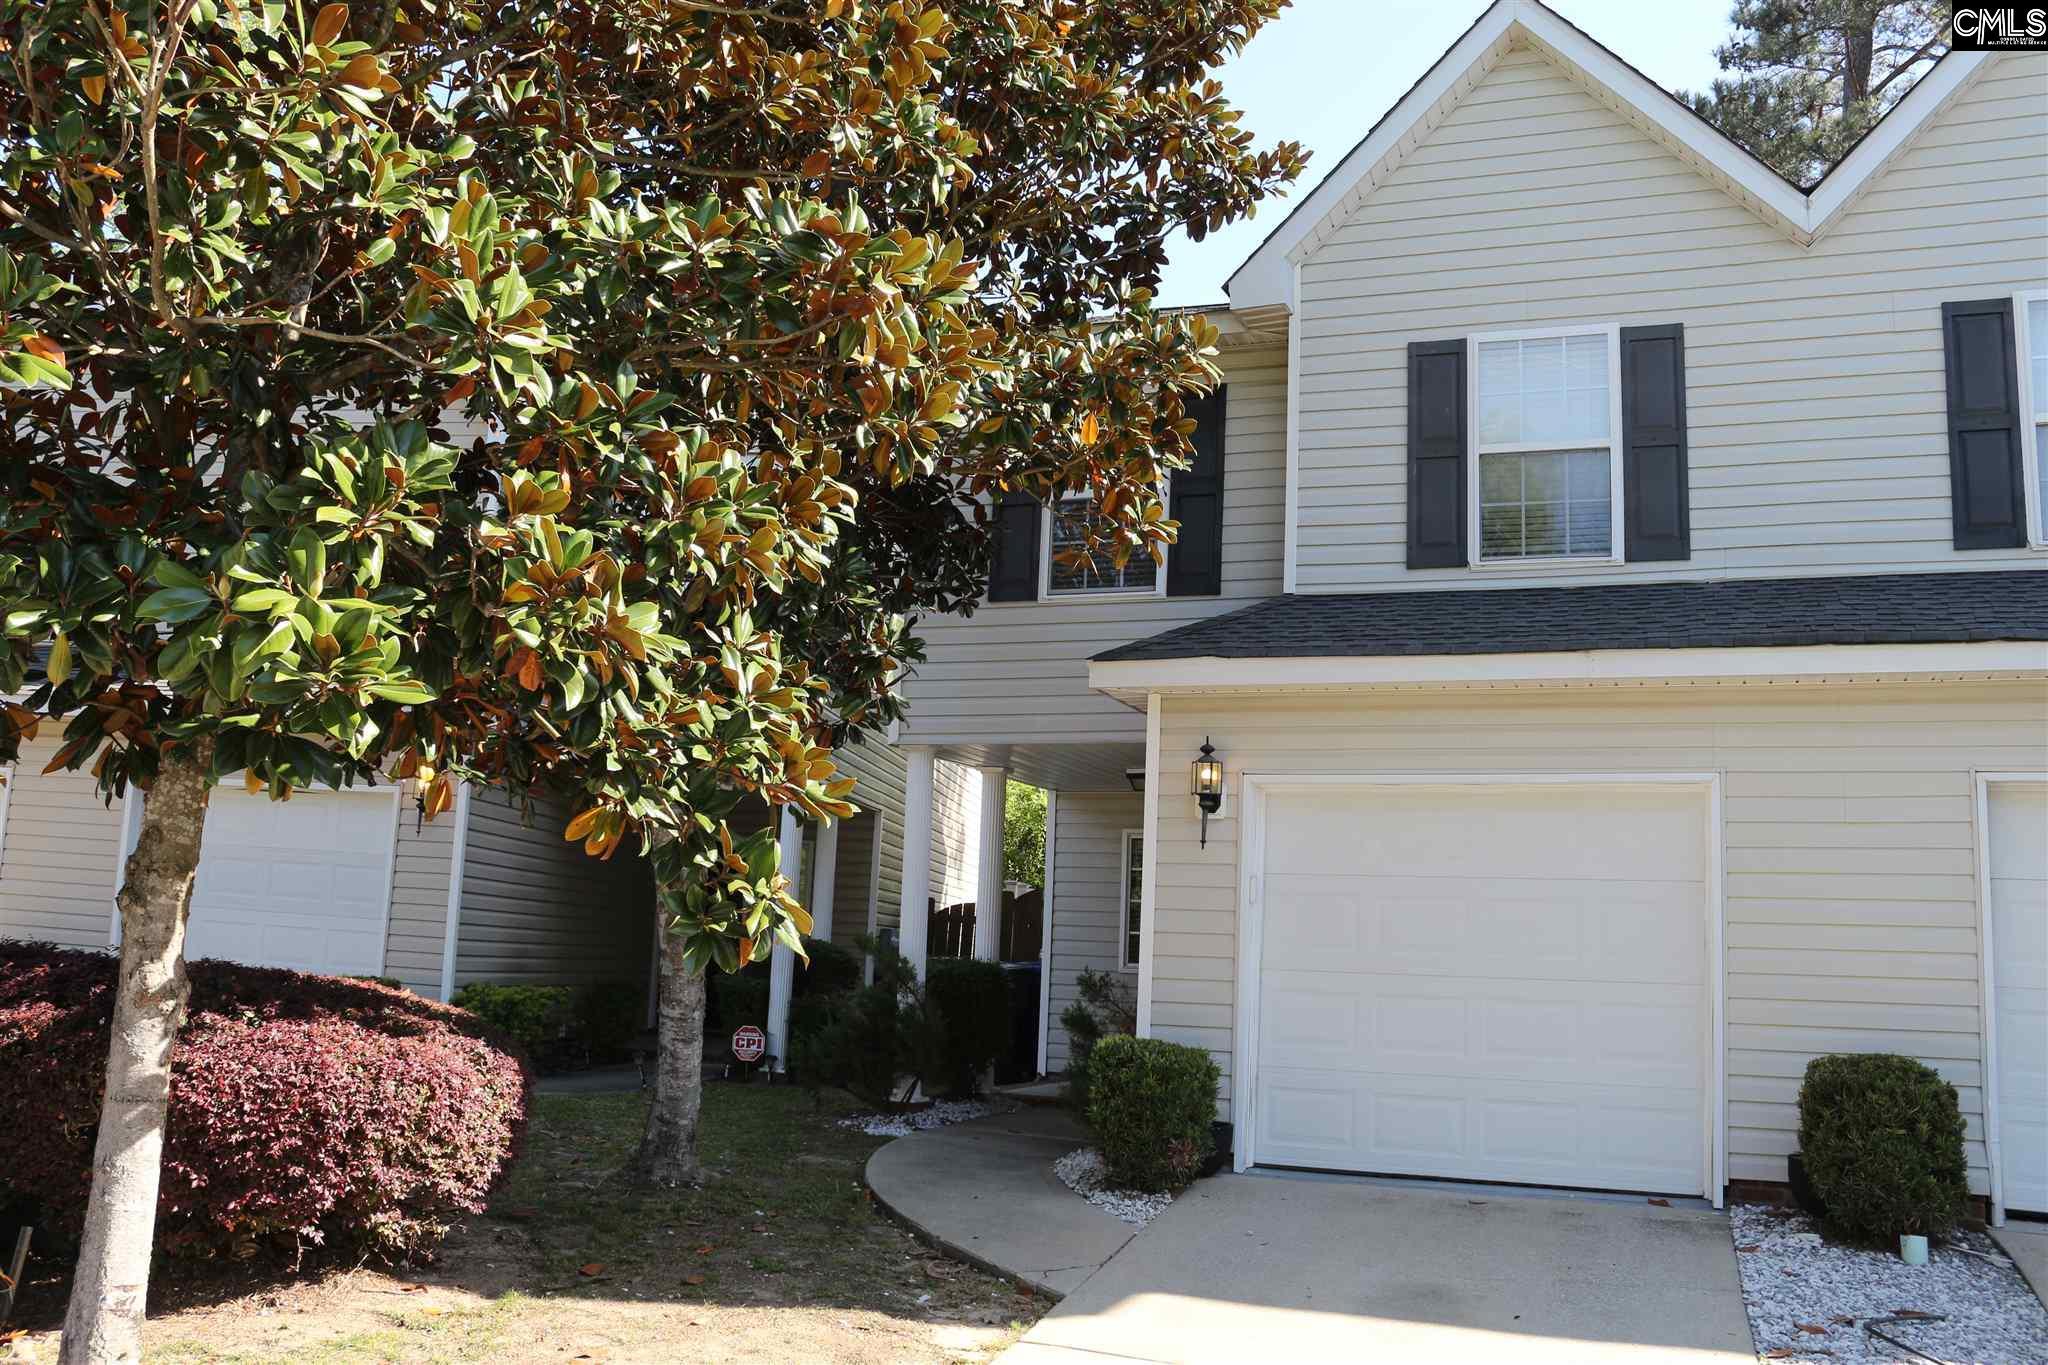 114 Courtyard Homes Drive Columbia, SC 29209